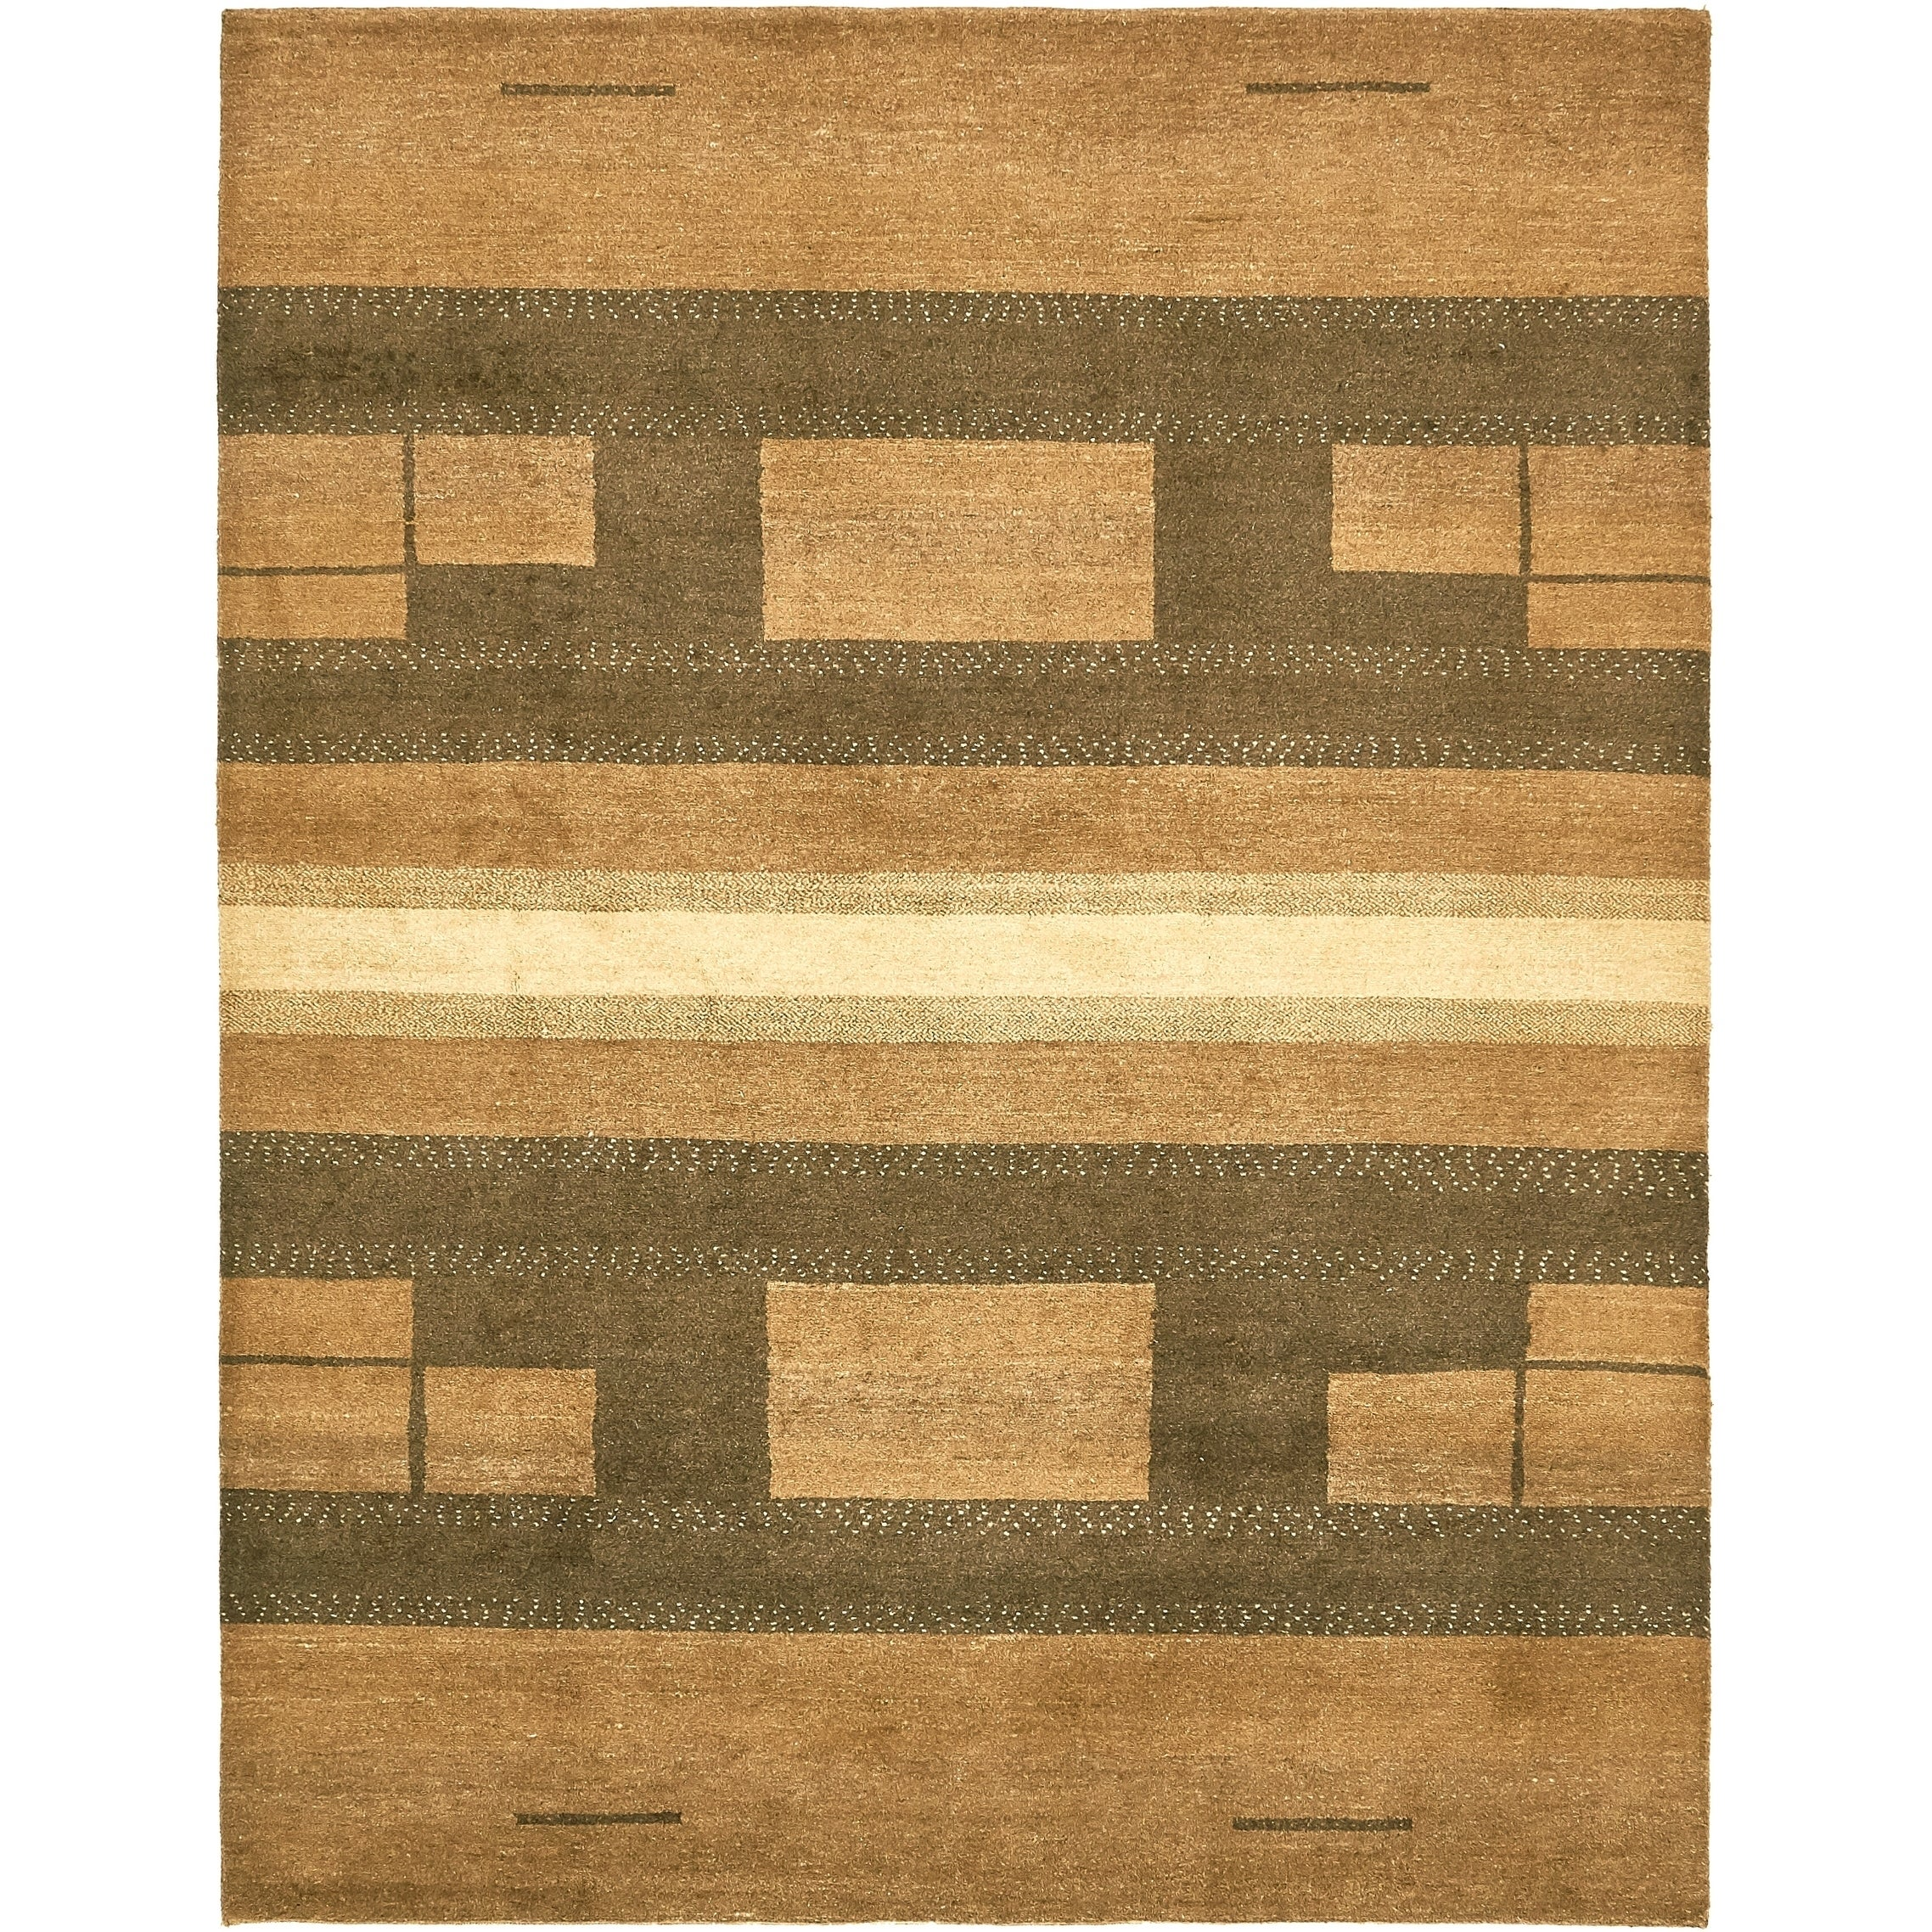 Hand Knotted Kashkuli Gabbeh Wool Area Rug - 6 4 x 8 (Burgundy - 6 4 x 8)